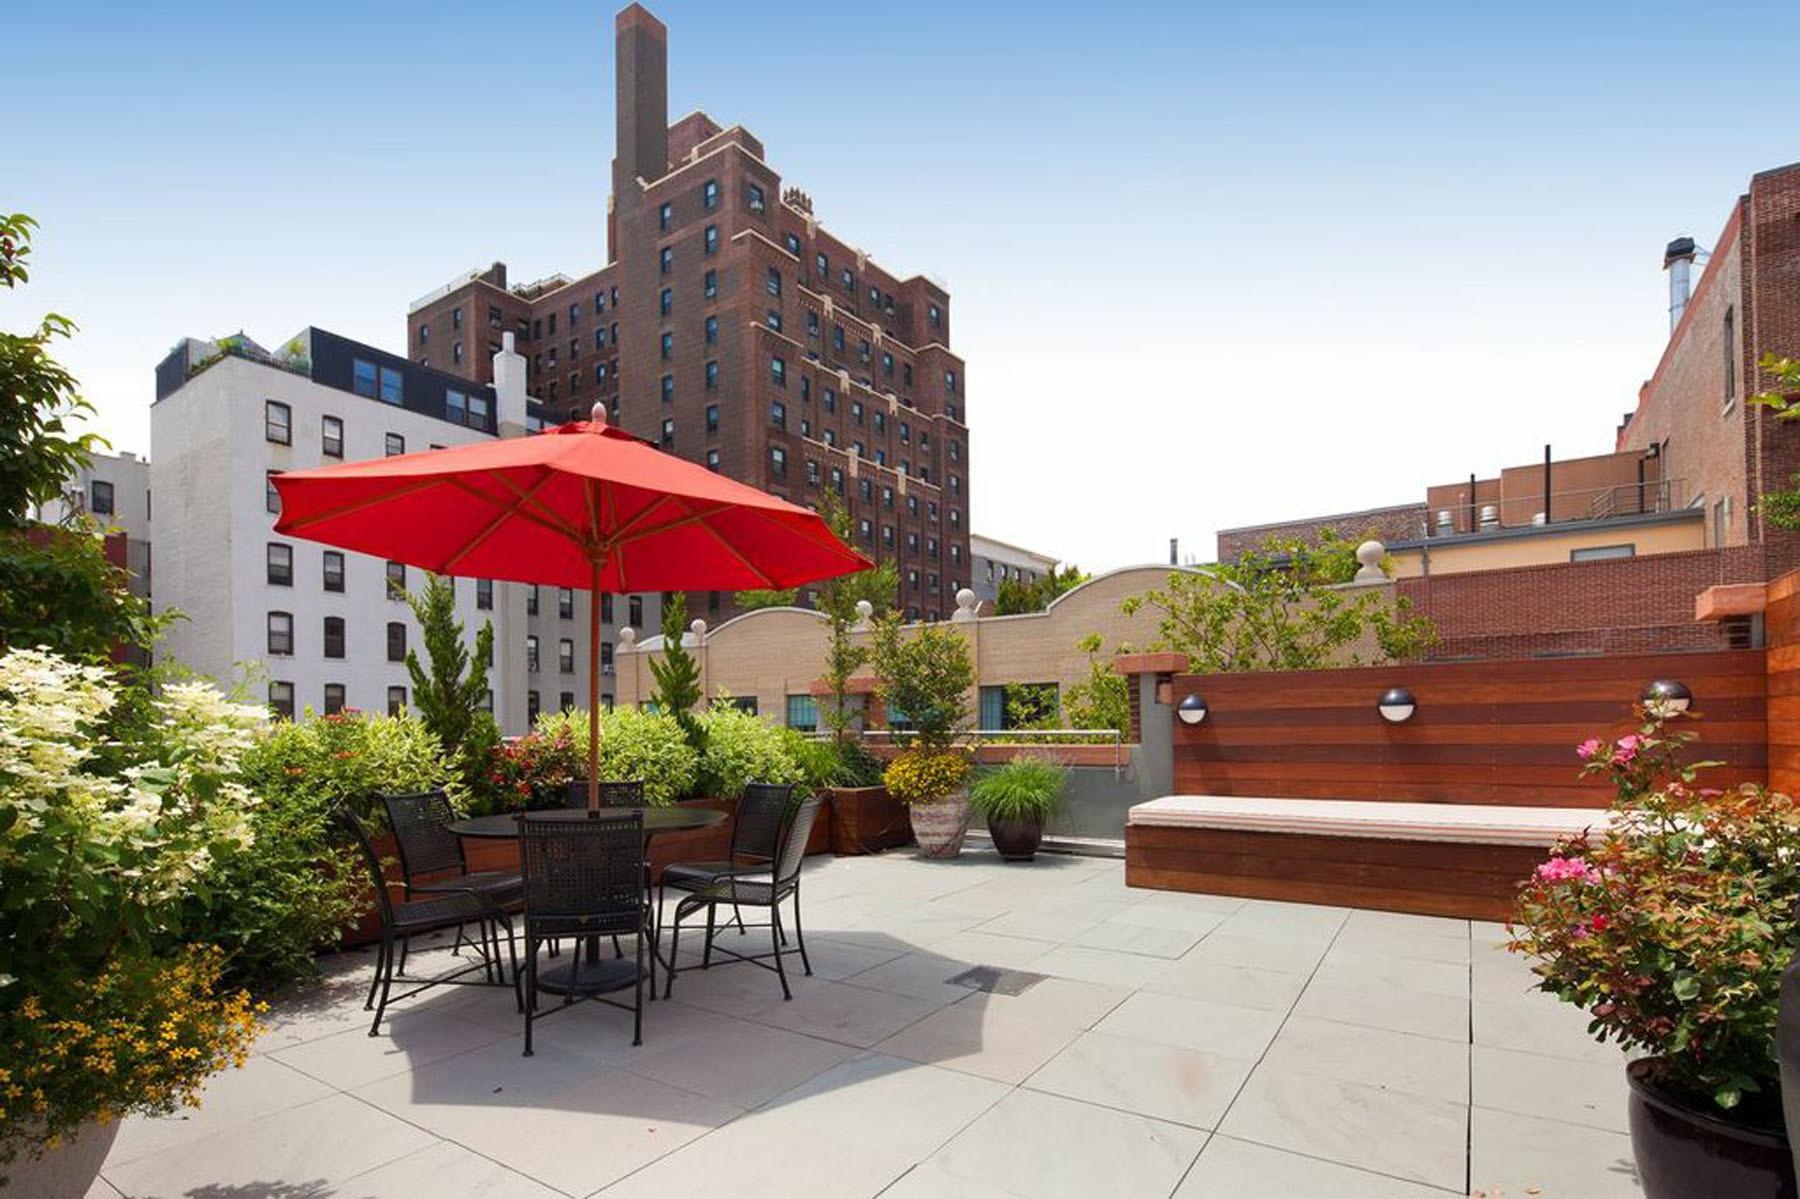 Rooftop Terrace Landscape  Brooklyn NYC Backyard Patio and Rooftop Terrace Garden